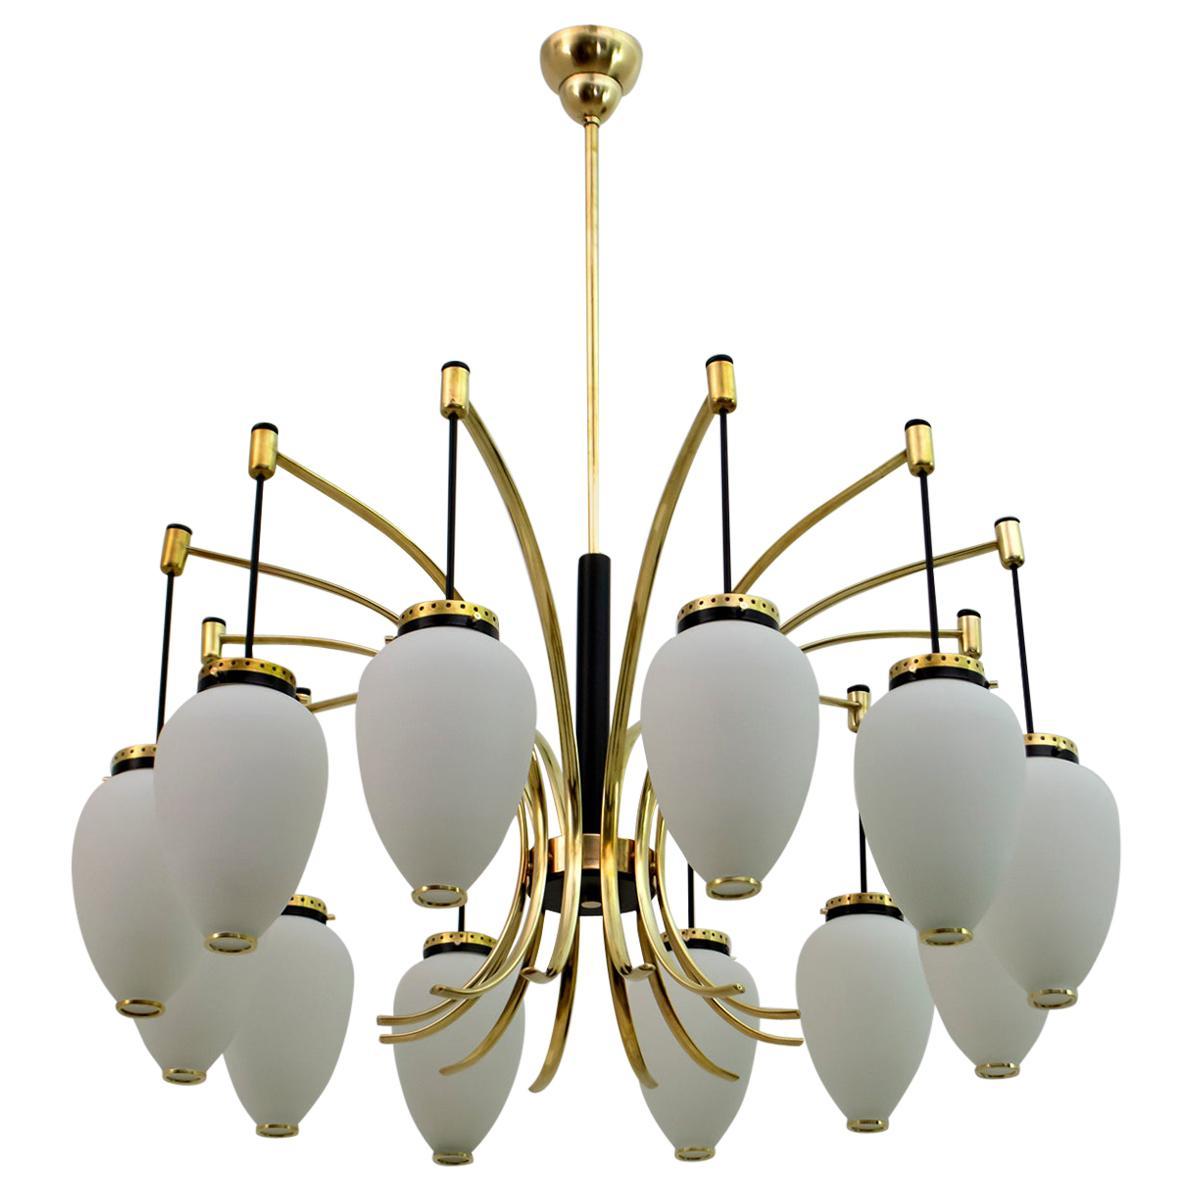 Stilnovo Mid-Century Modern Italian Brass Opaline Glass 12-Light Chandelier, 50s